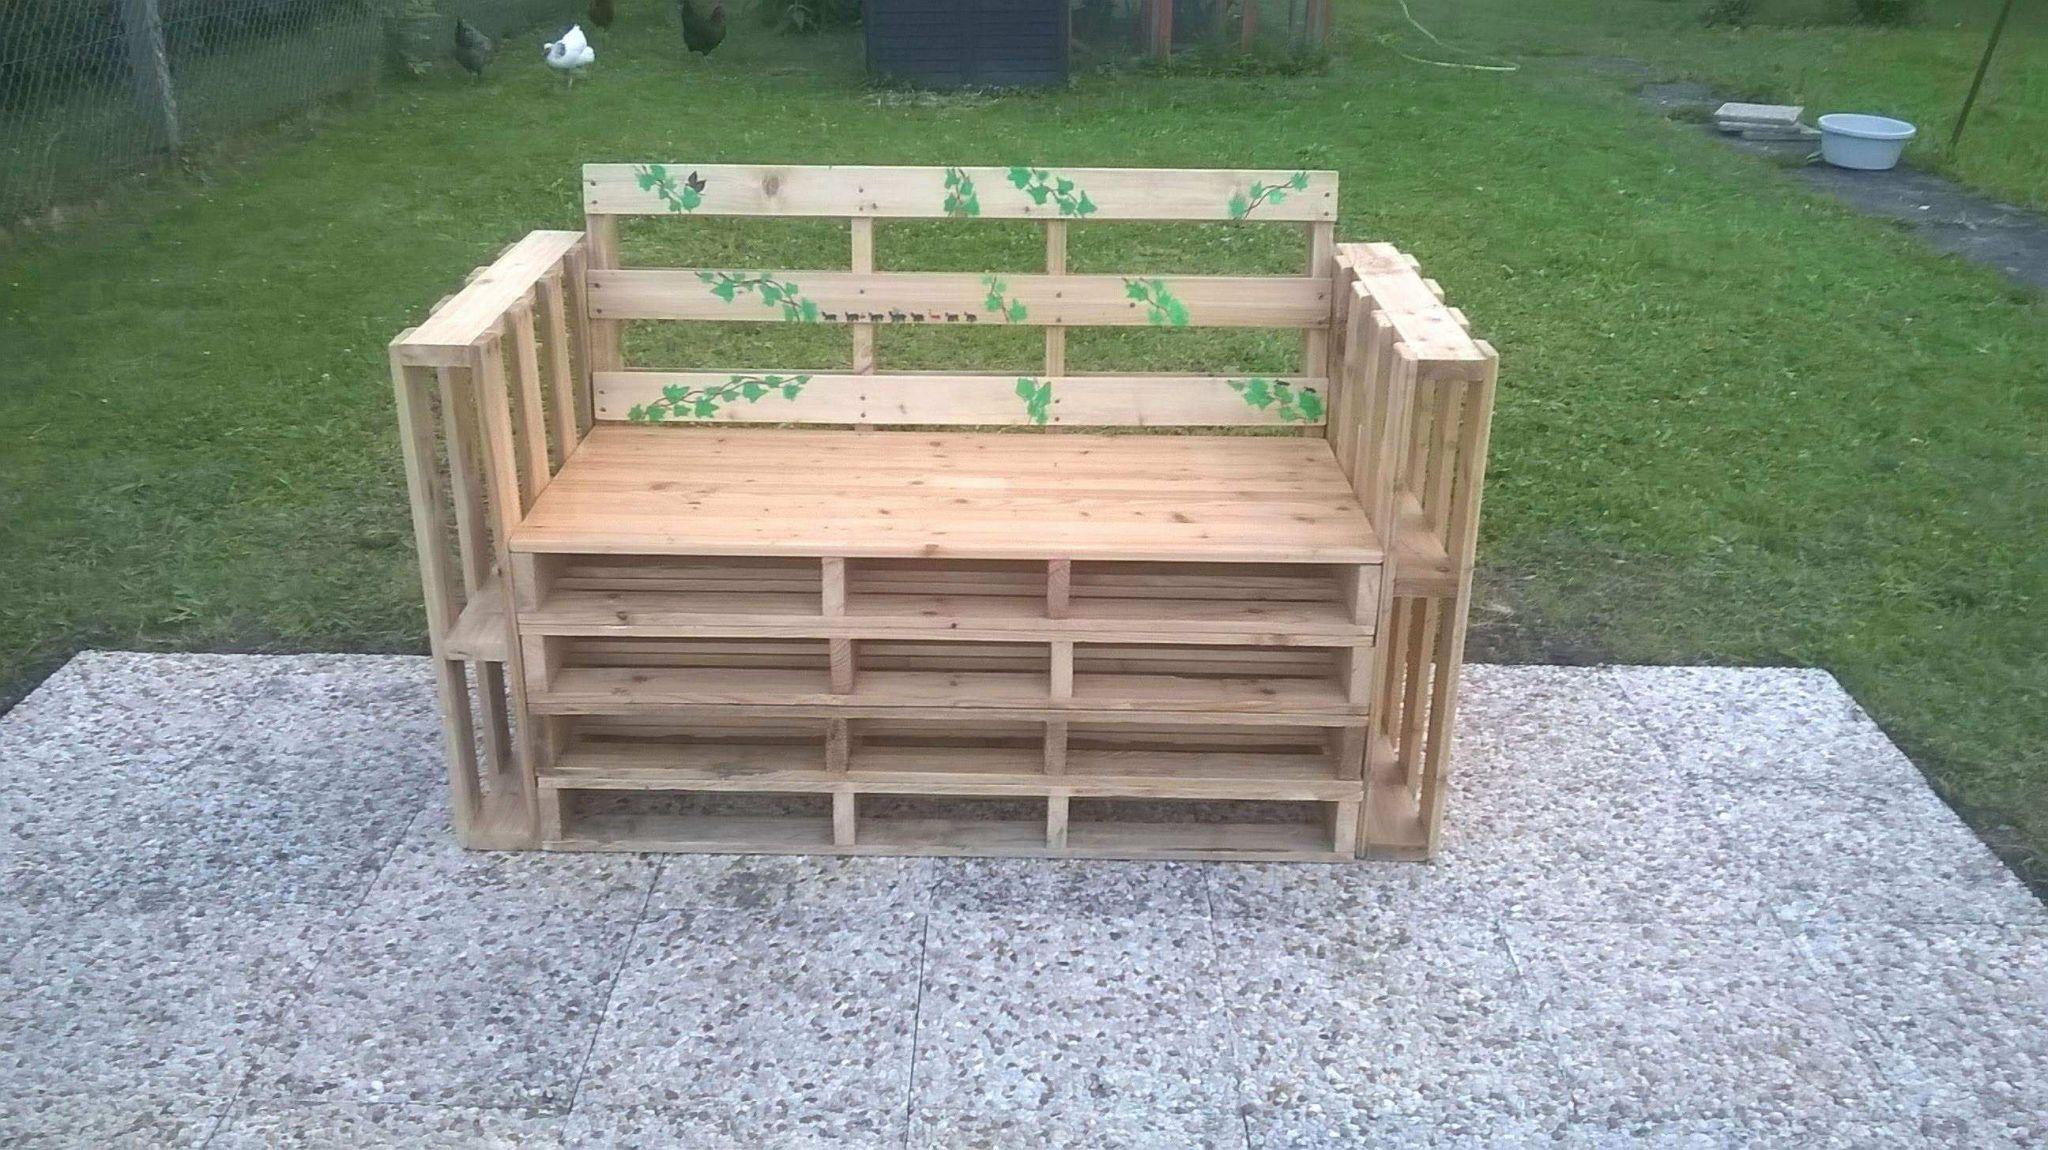 Amazon Mobilier De Jardin Charmant Salon De Jardin Pas Cher Inspirant Amazon Serre De Jardin